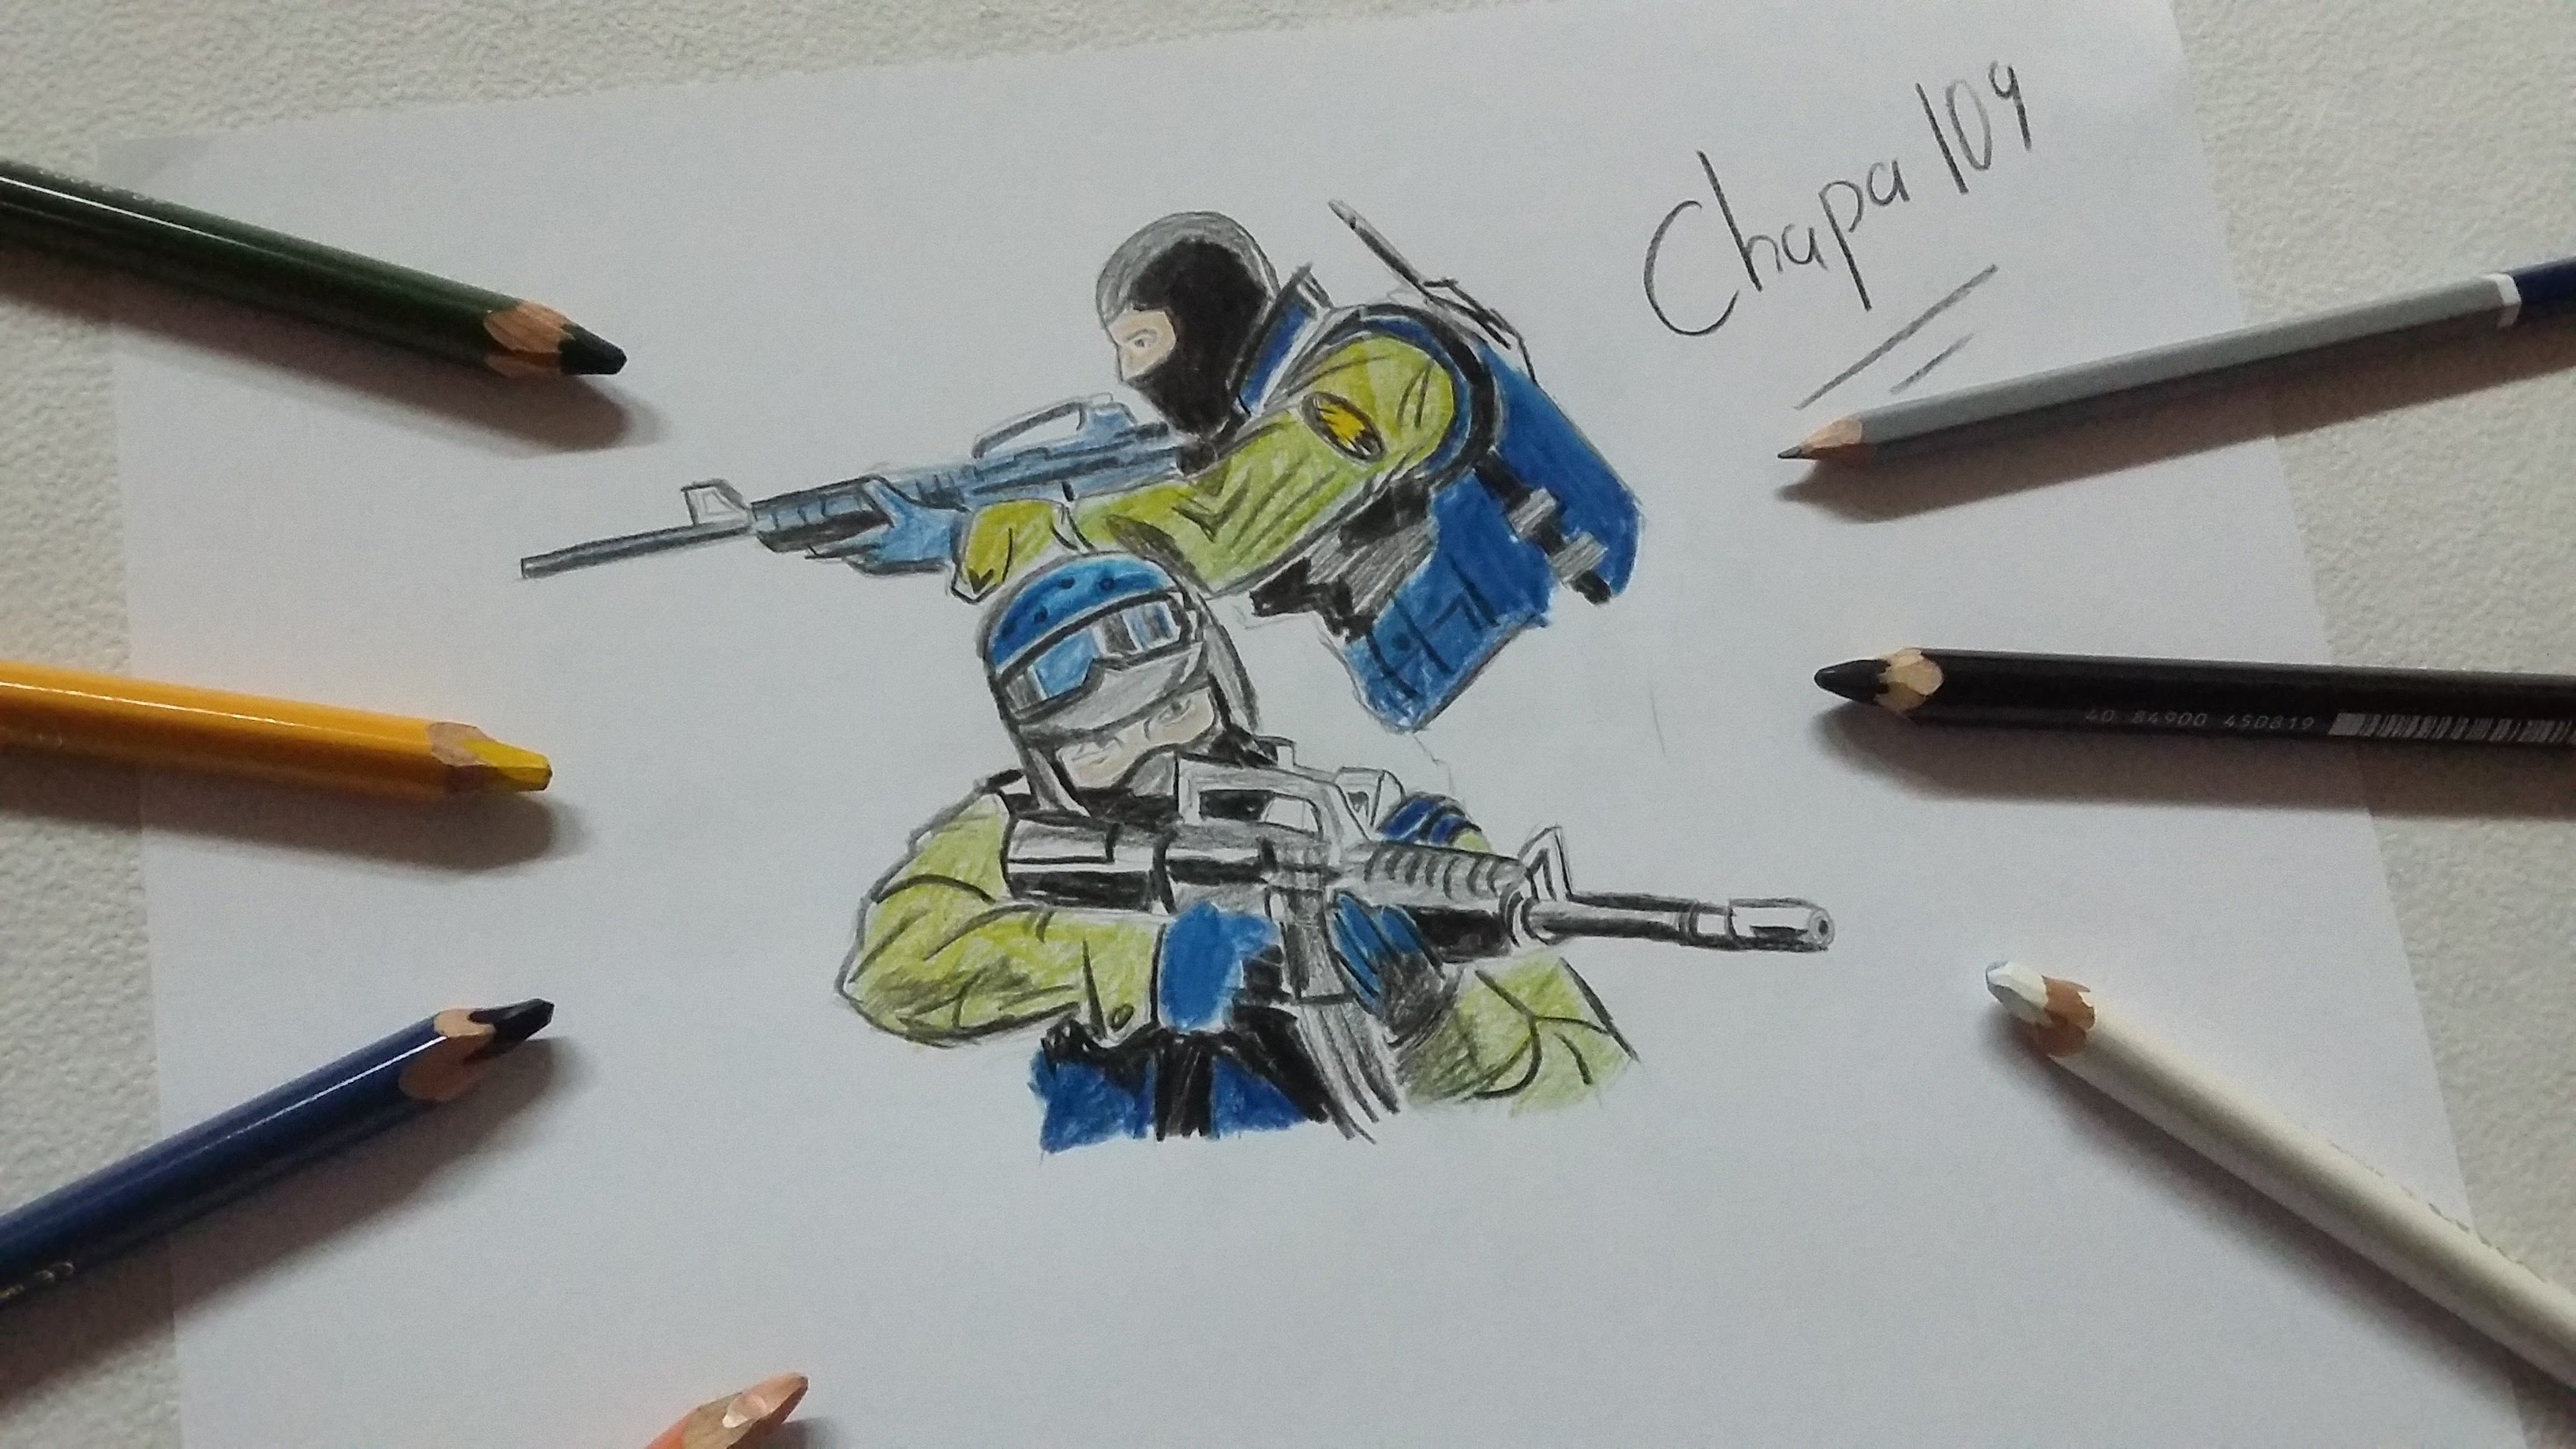 3264x1836 Dibujo De Cs Go Counter Strike Drawing Cs Go Counter Strike